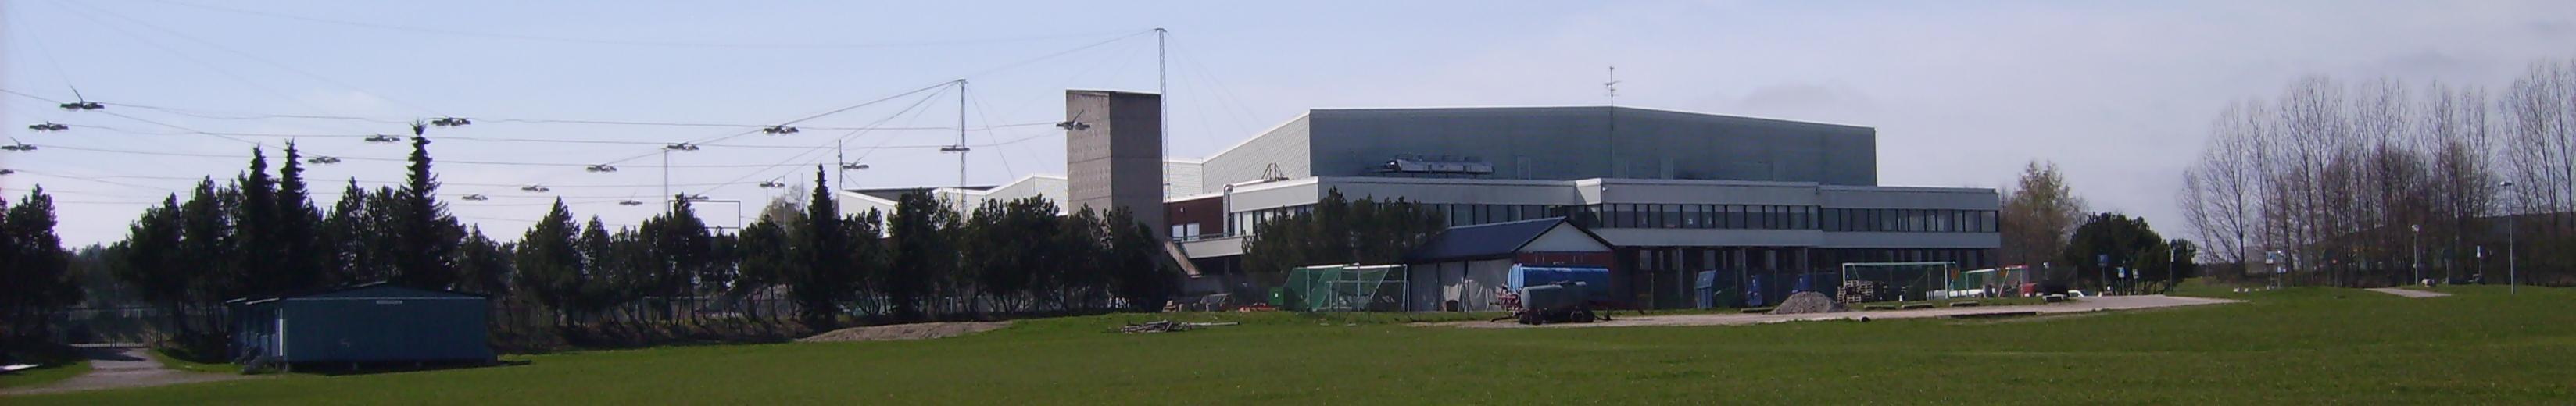 Himmelstalundshallen